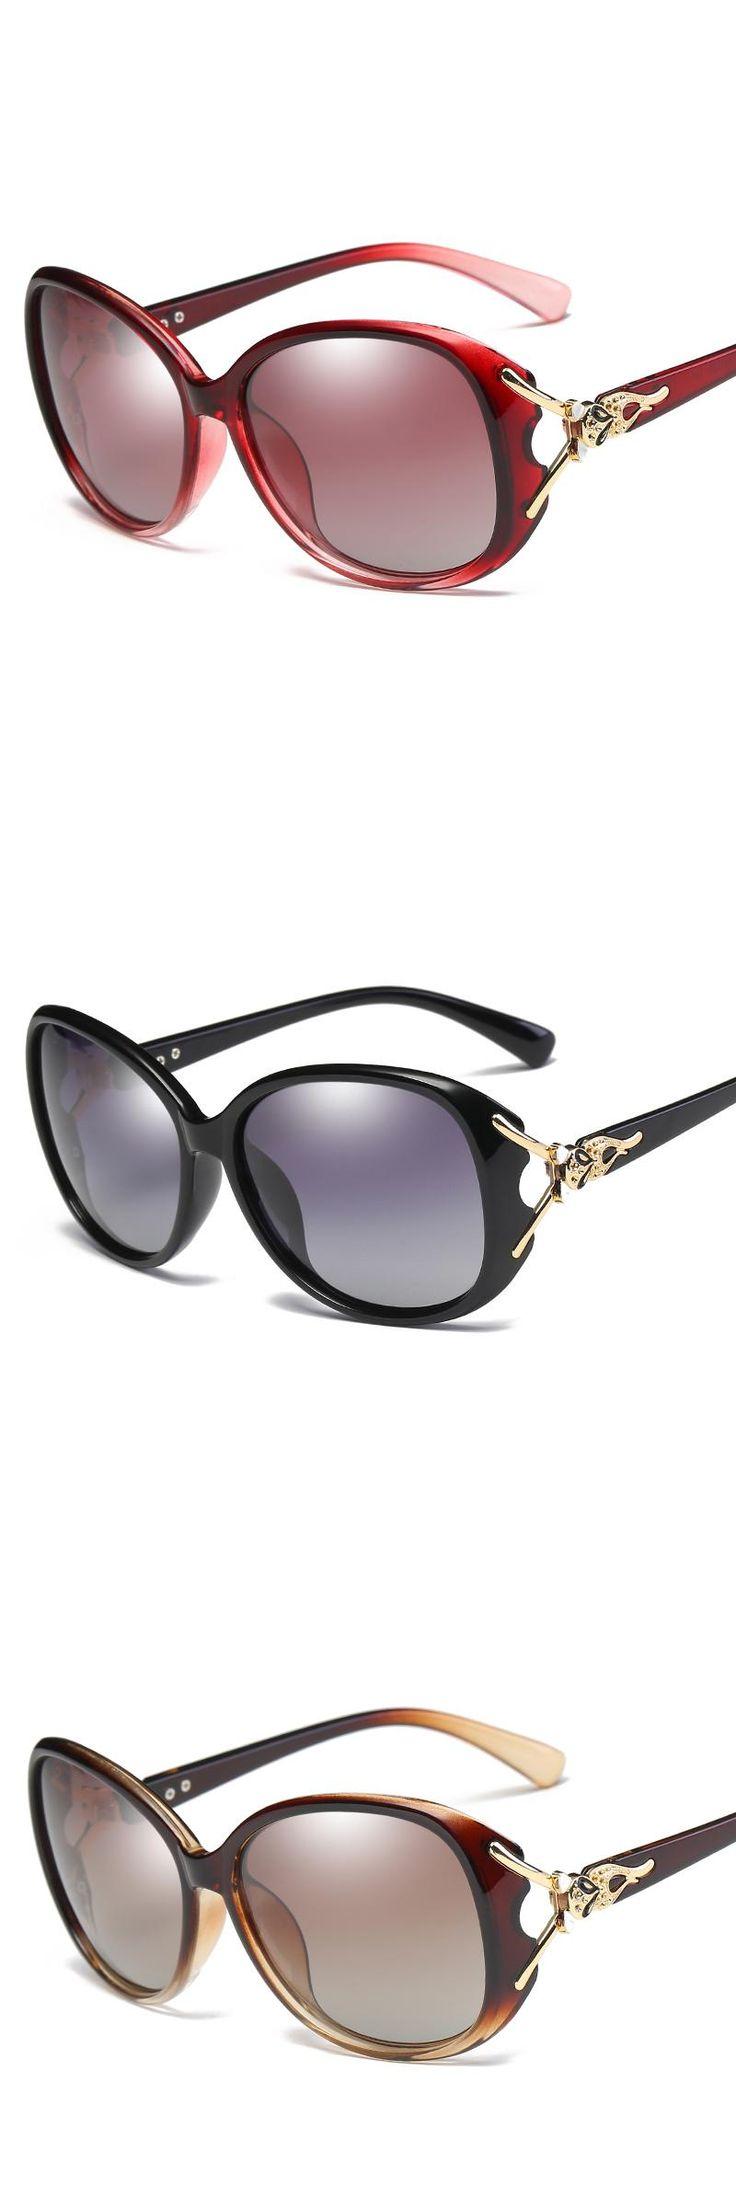 YAYA Fashion Big Frame Polarized Sunglasses Women Brand Designer Driving Sun Glasses Gafas De Sol Mujer